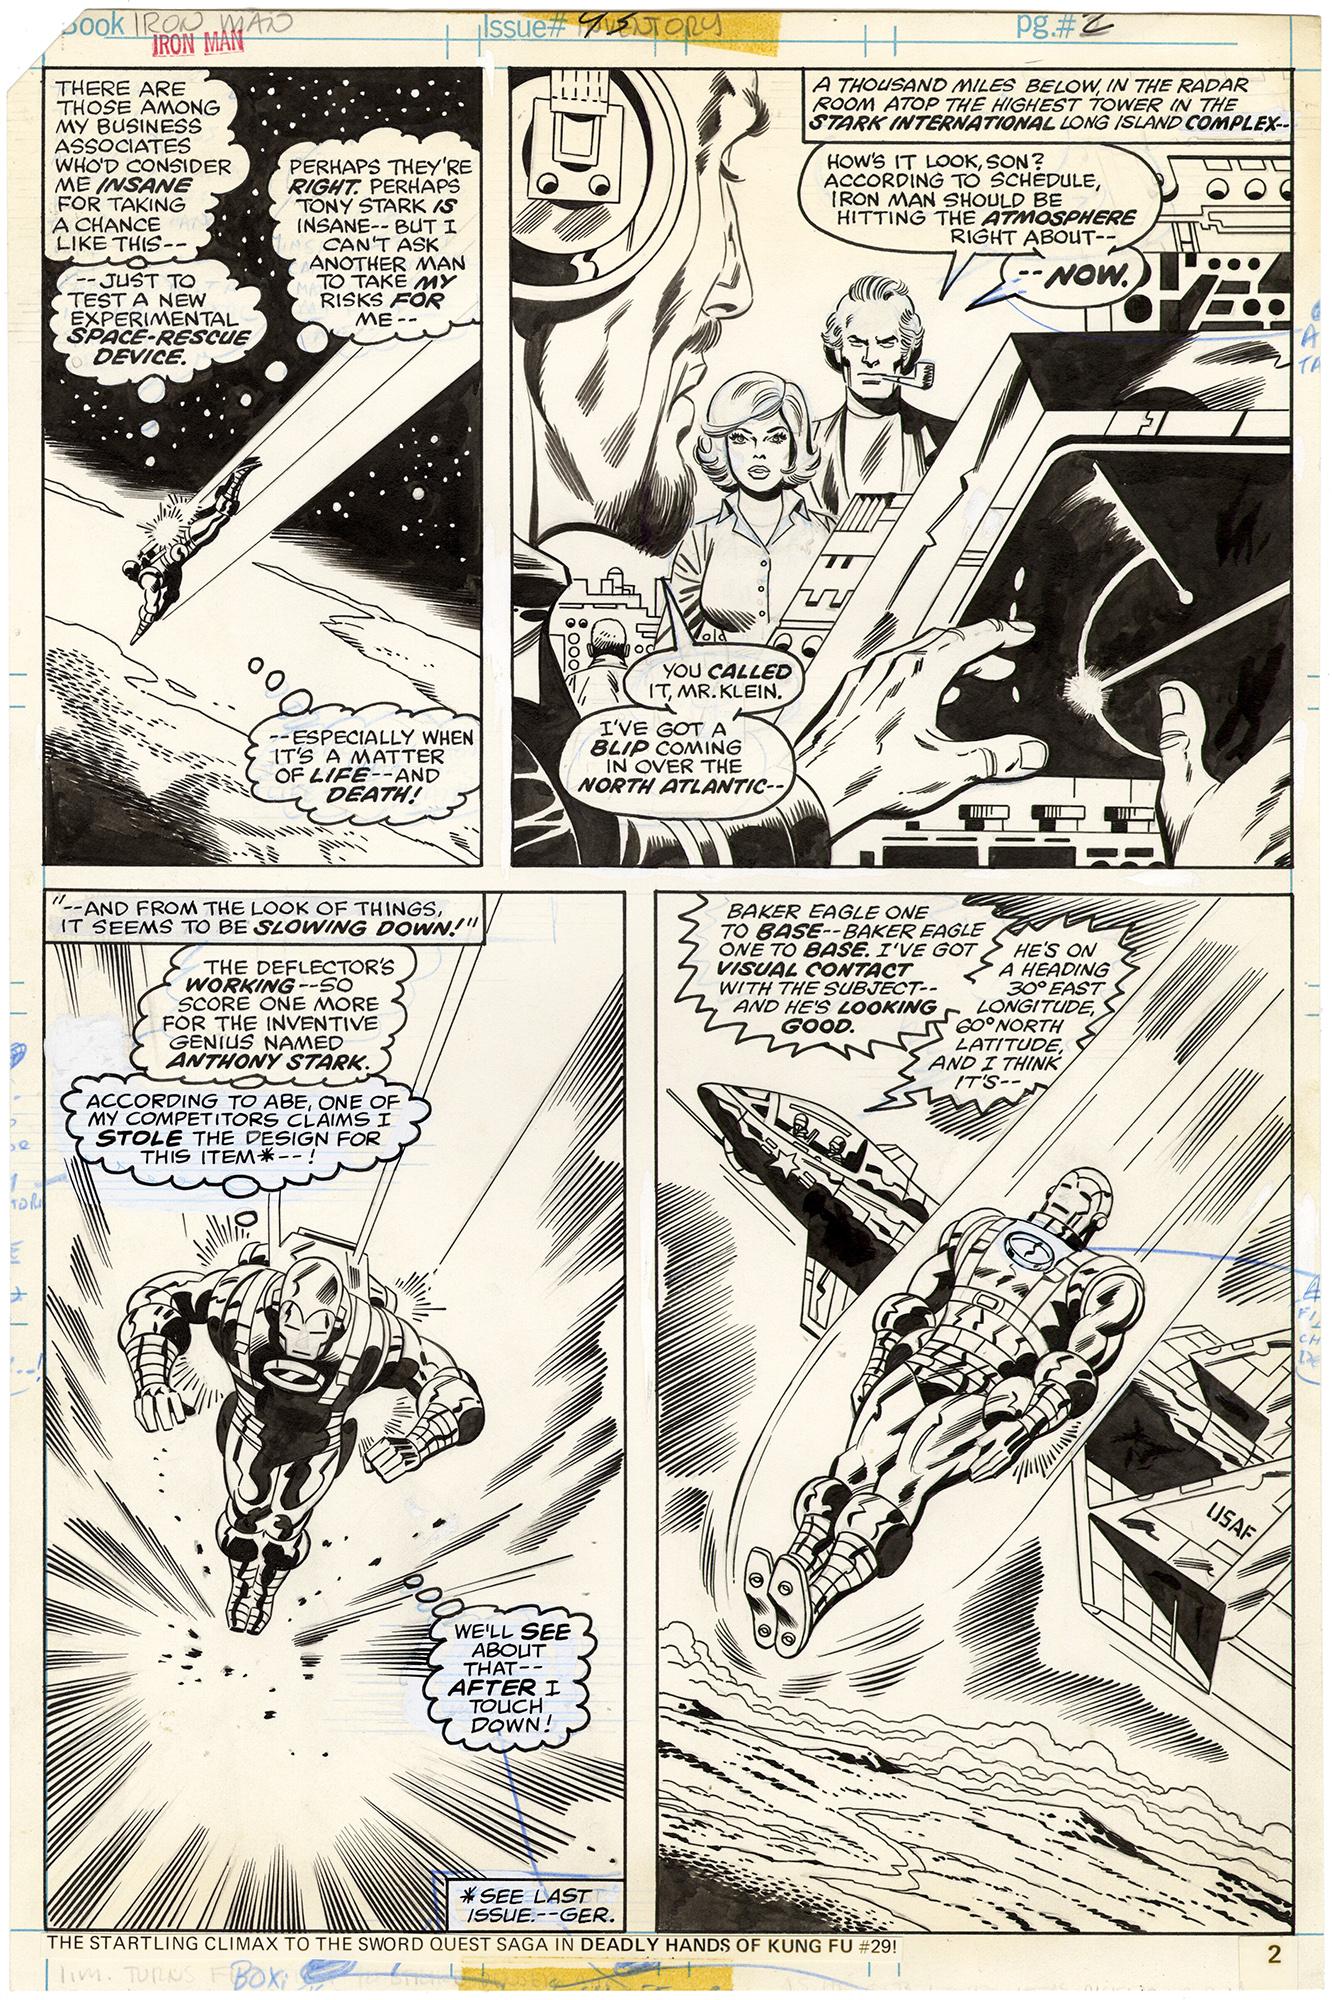 Iron Man #93 p2